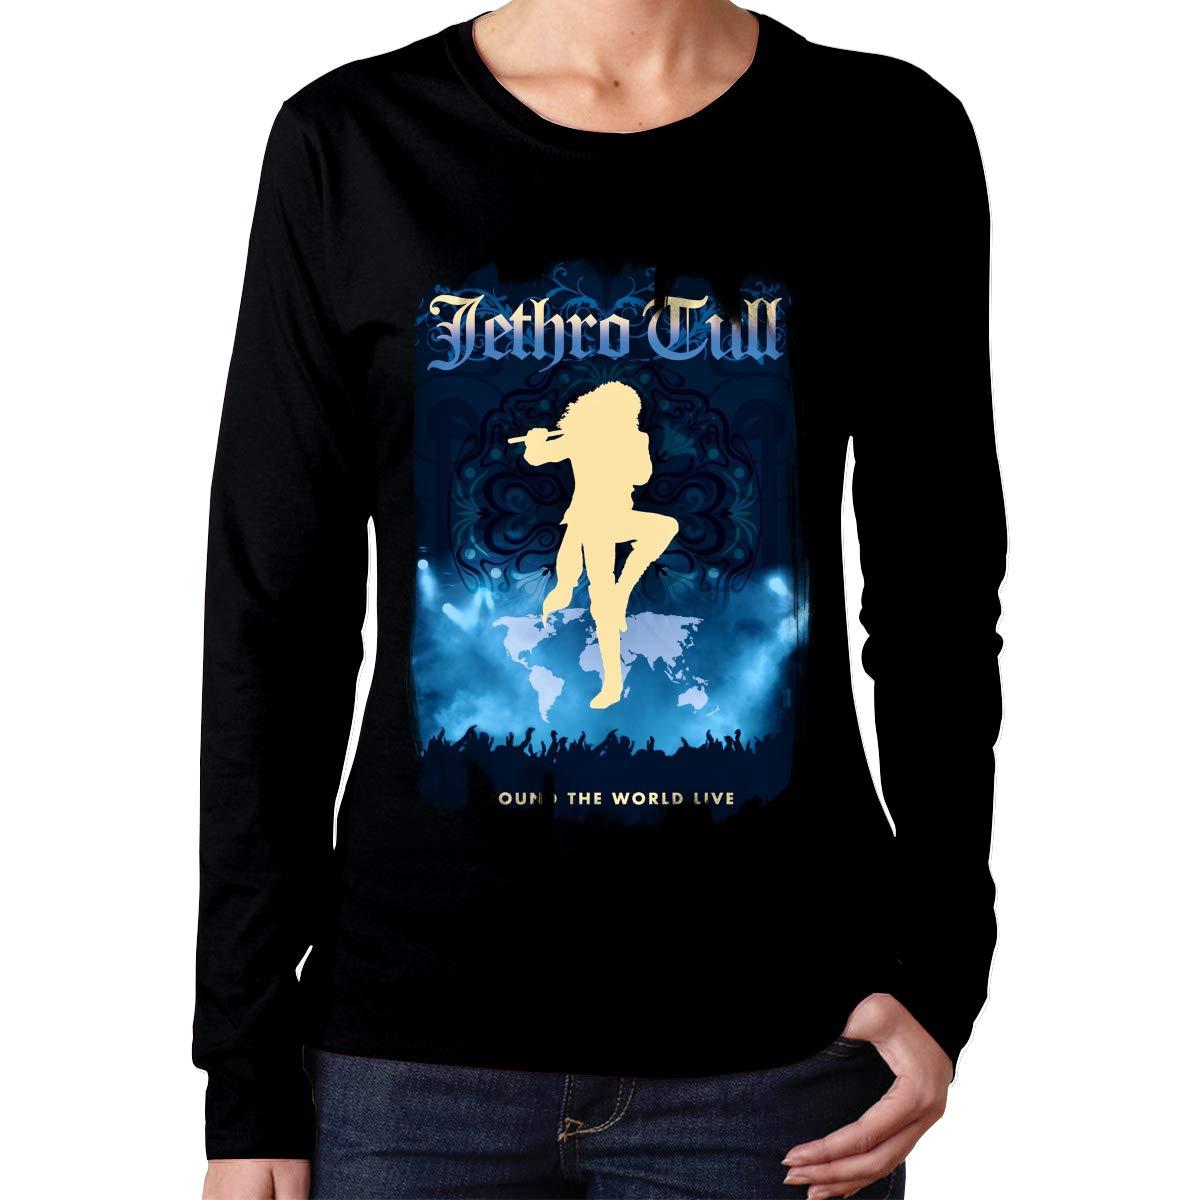 Qiyyqi Jethro Tull T Shirt Woman S T Shirt 7032